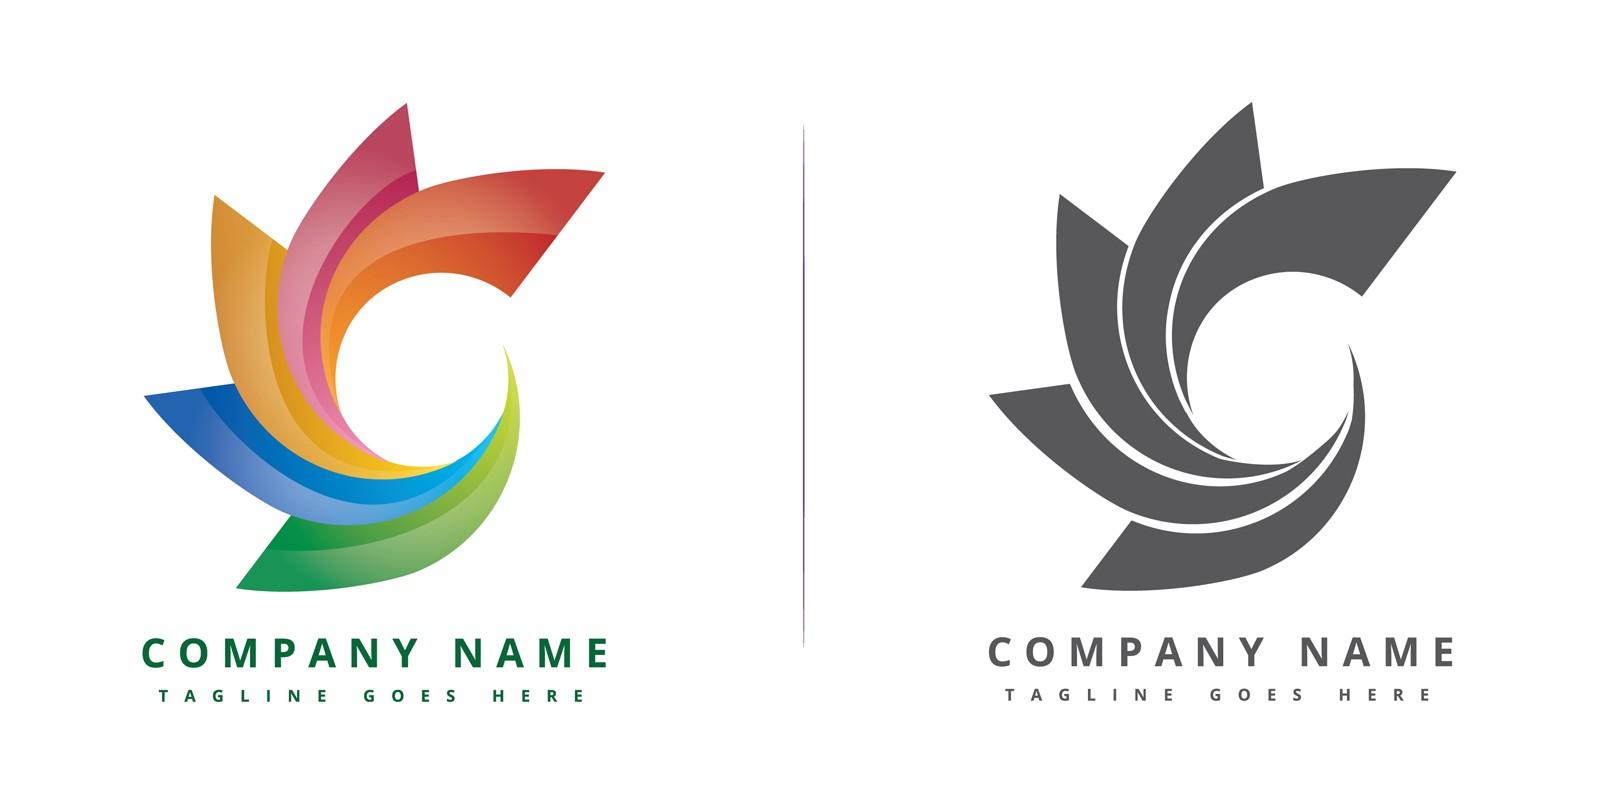 colorful circle company logo